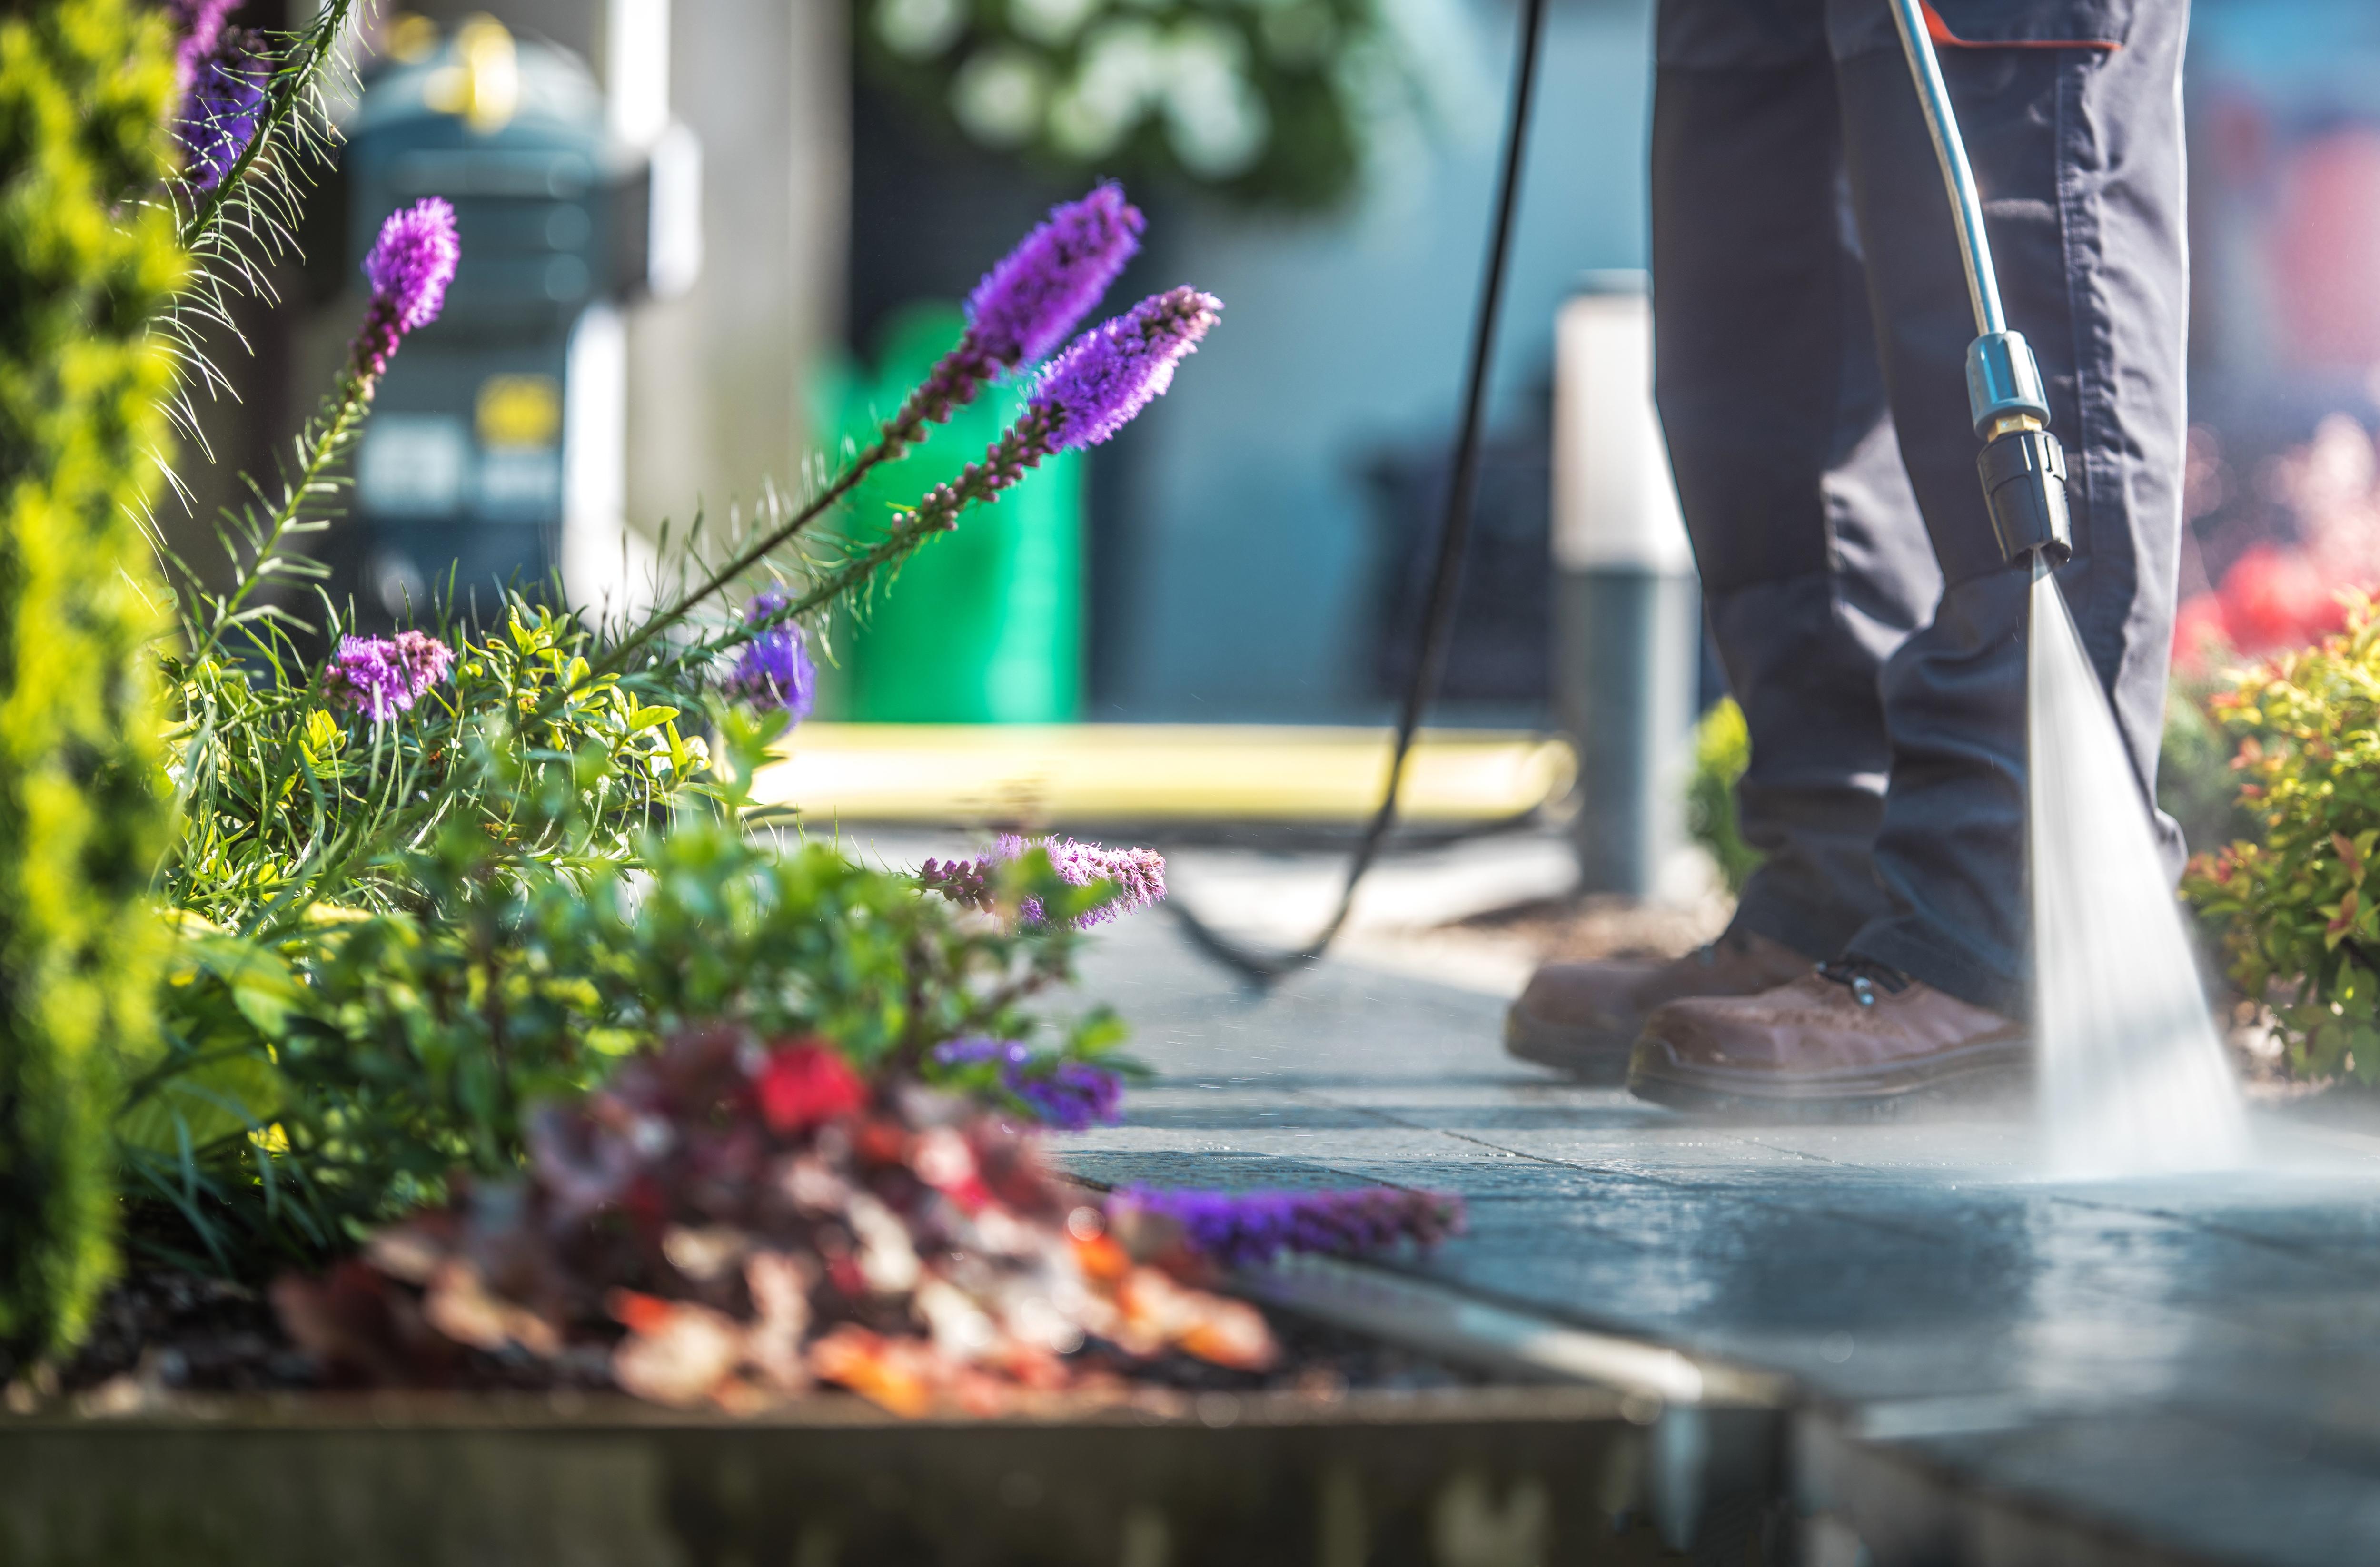 mantenimiento-de-jardines-sergeder